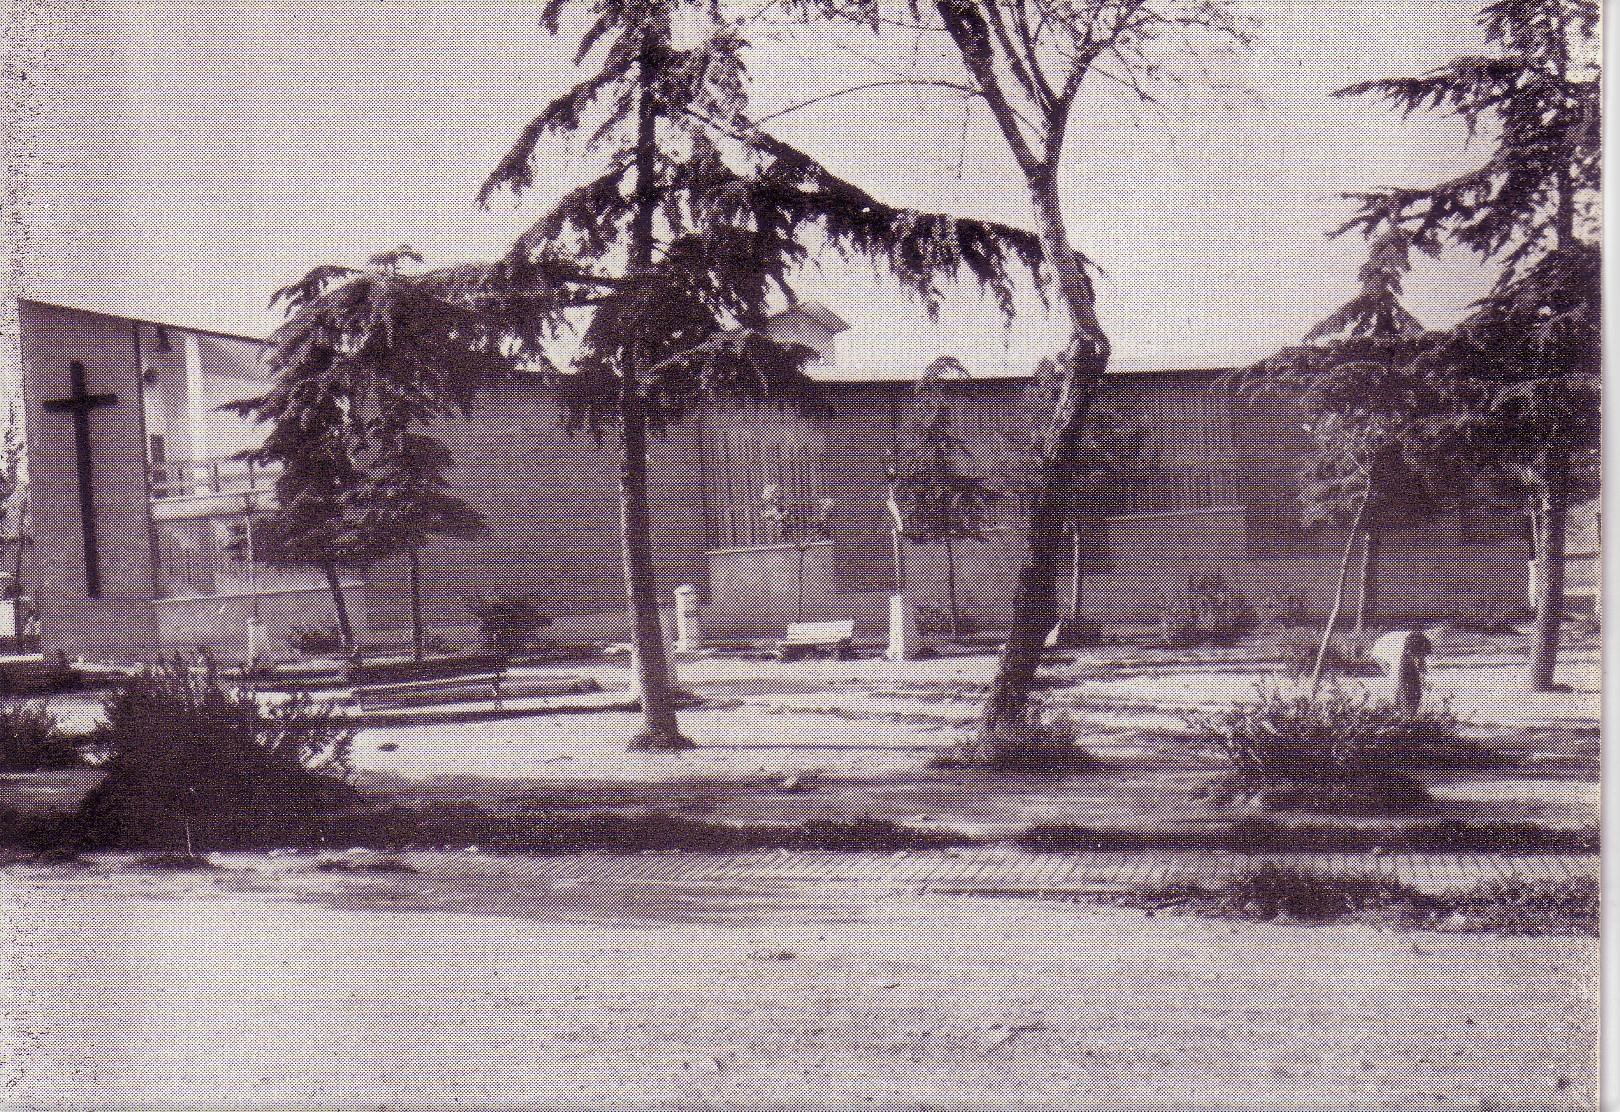 Plaza del Minero e Iglesia San Antonio de Padua. 1972